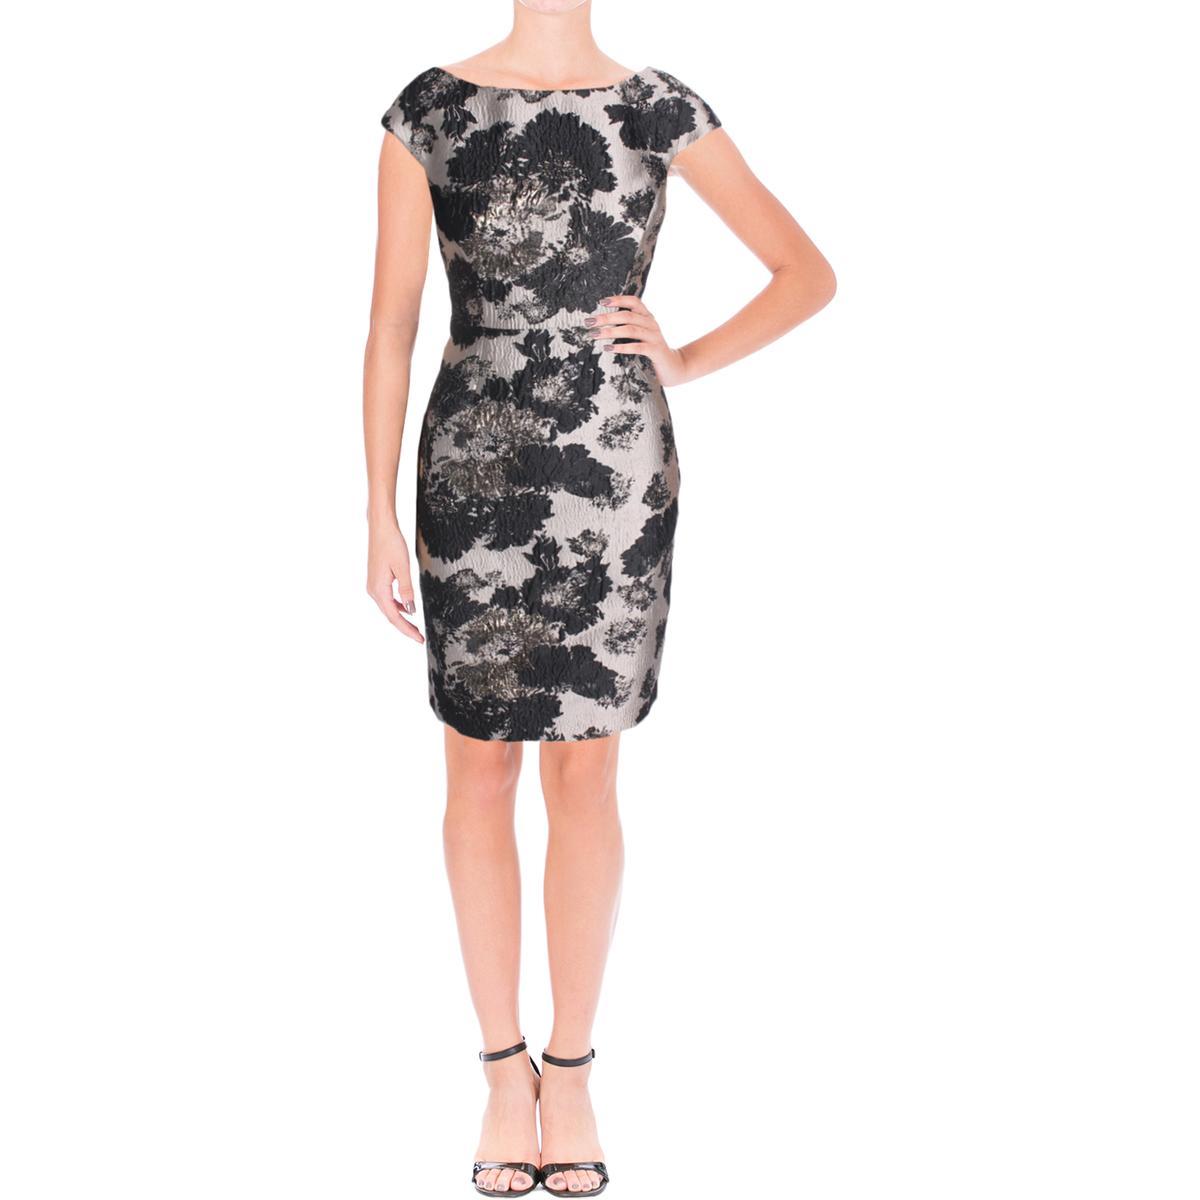 Vera Wang 7759 Womens Silver Jacquard Metallic Party Cocktail Dress ...